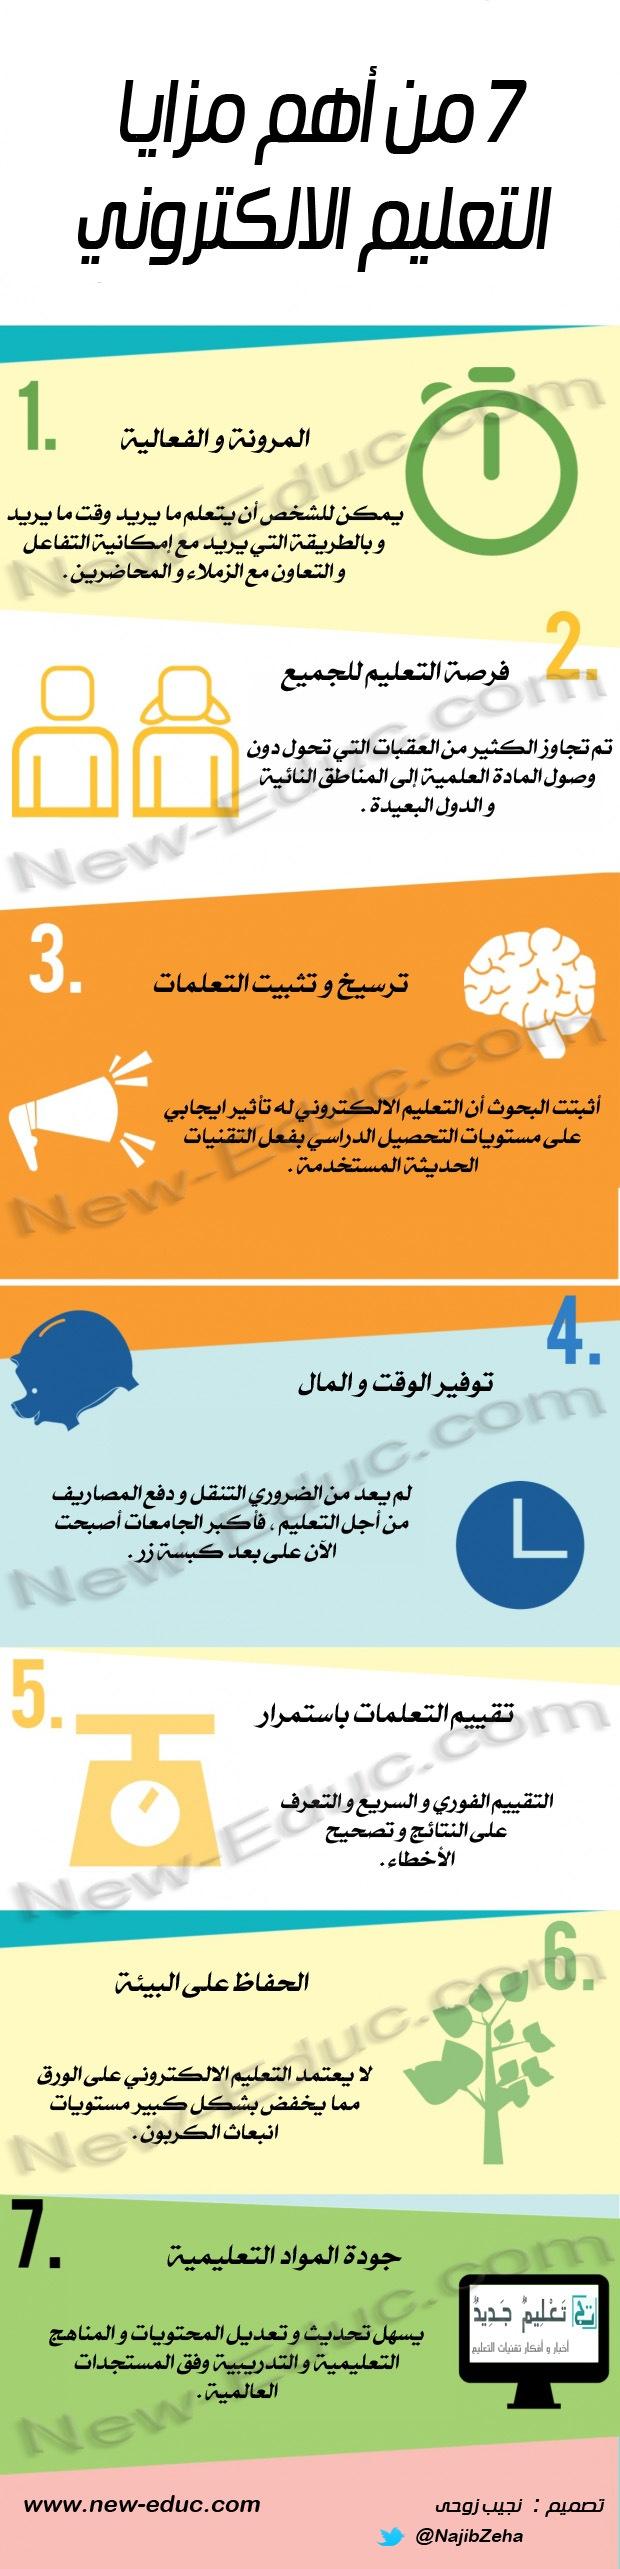 من أهم مزايا التعليم الالكتروني E Learning Http Www New Educ Com Avantages Du E Learning Learn Arabic Language Education Learning Arabic